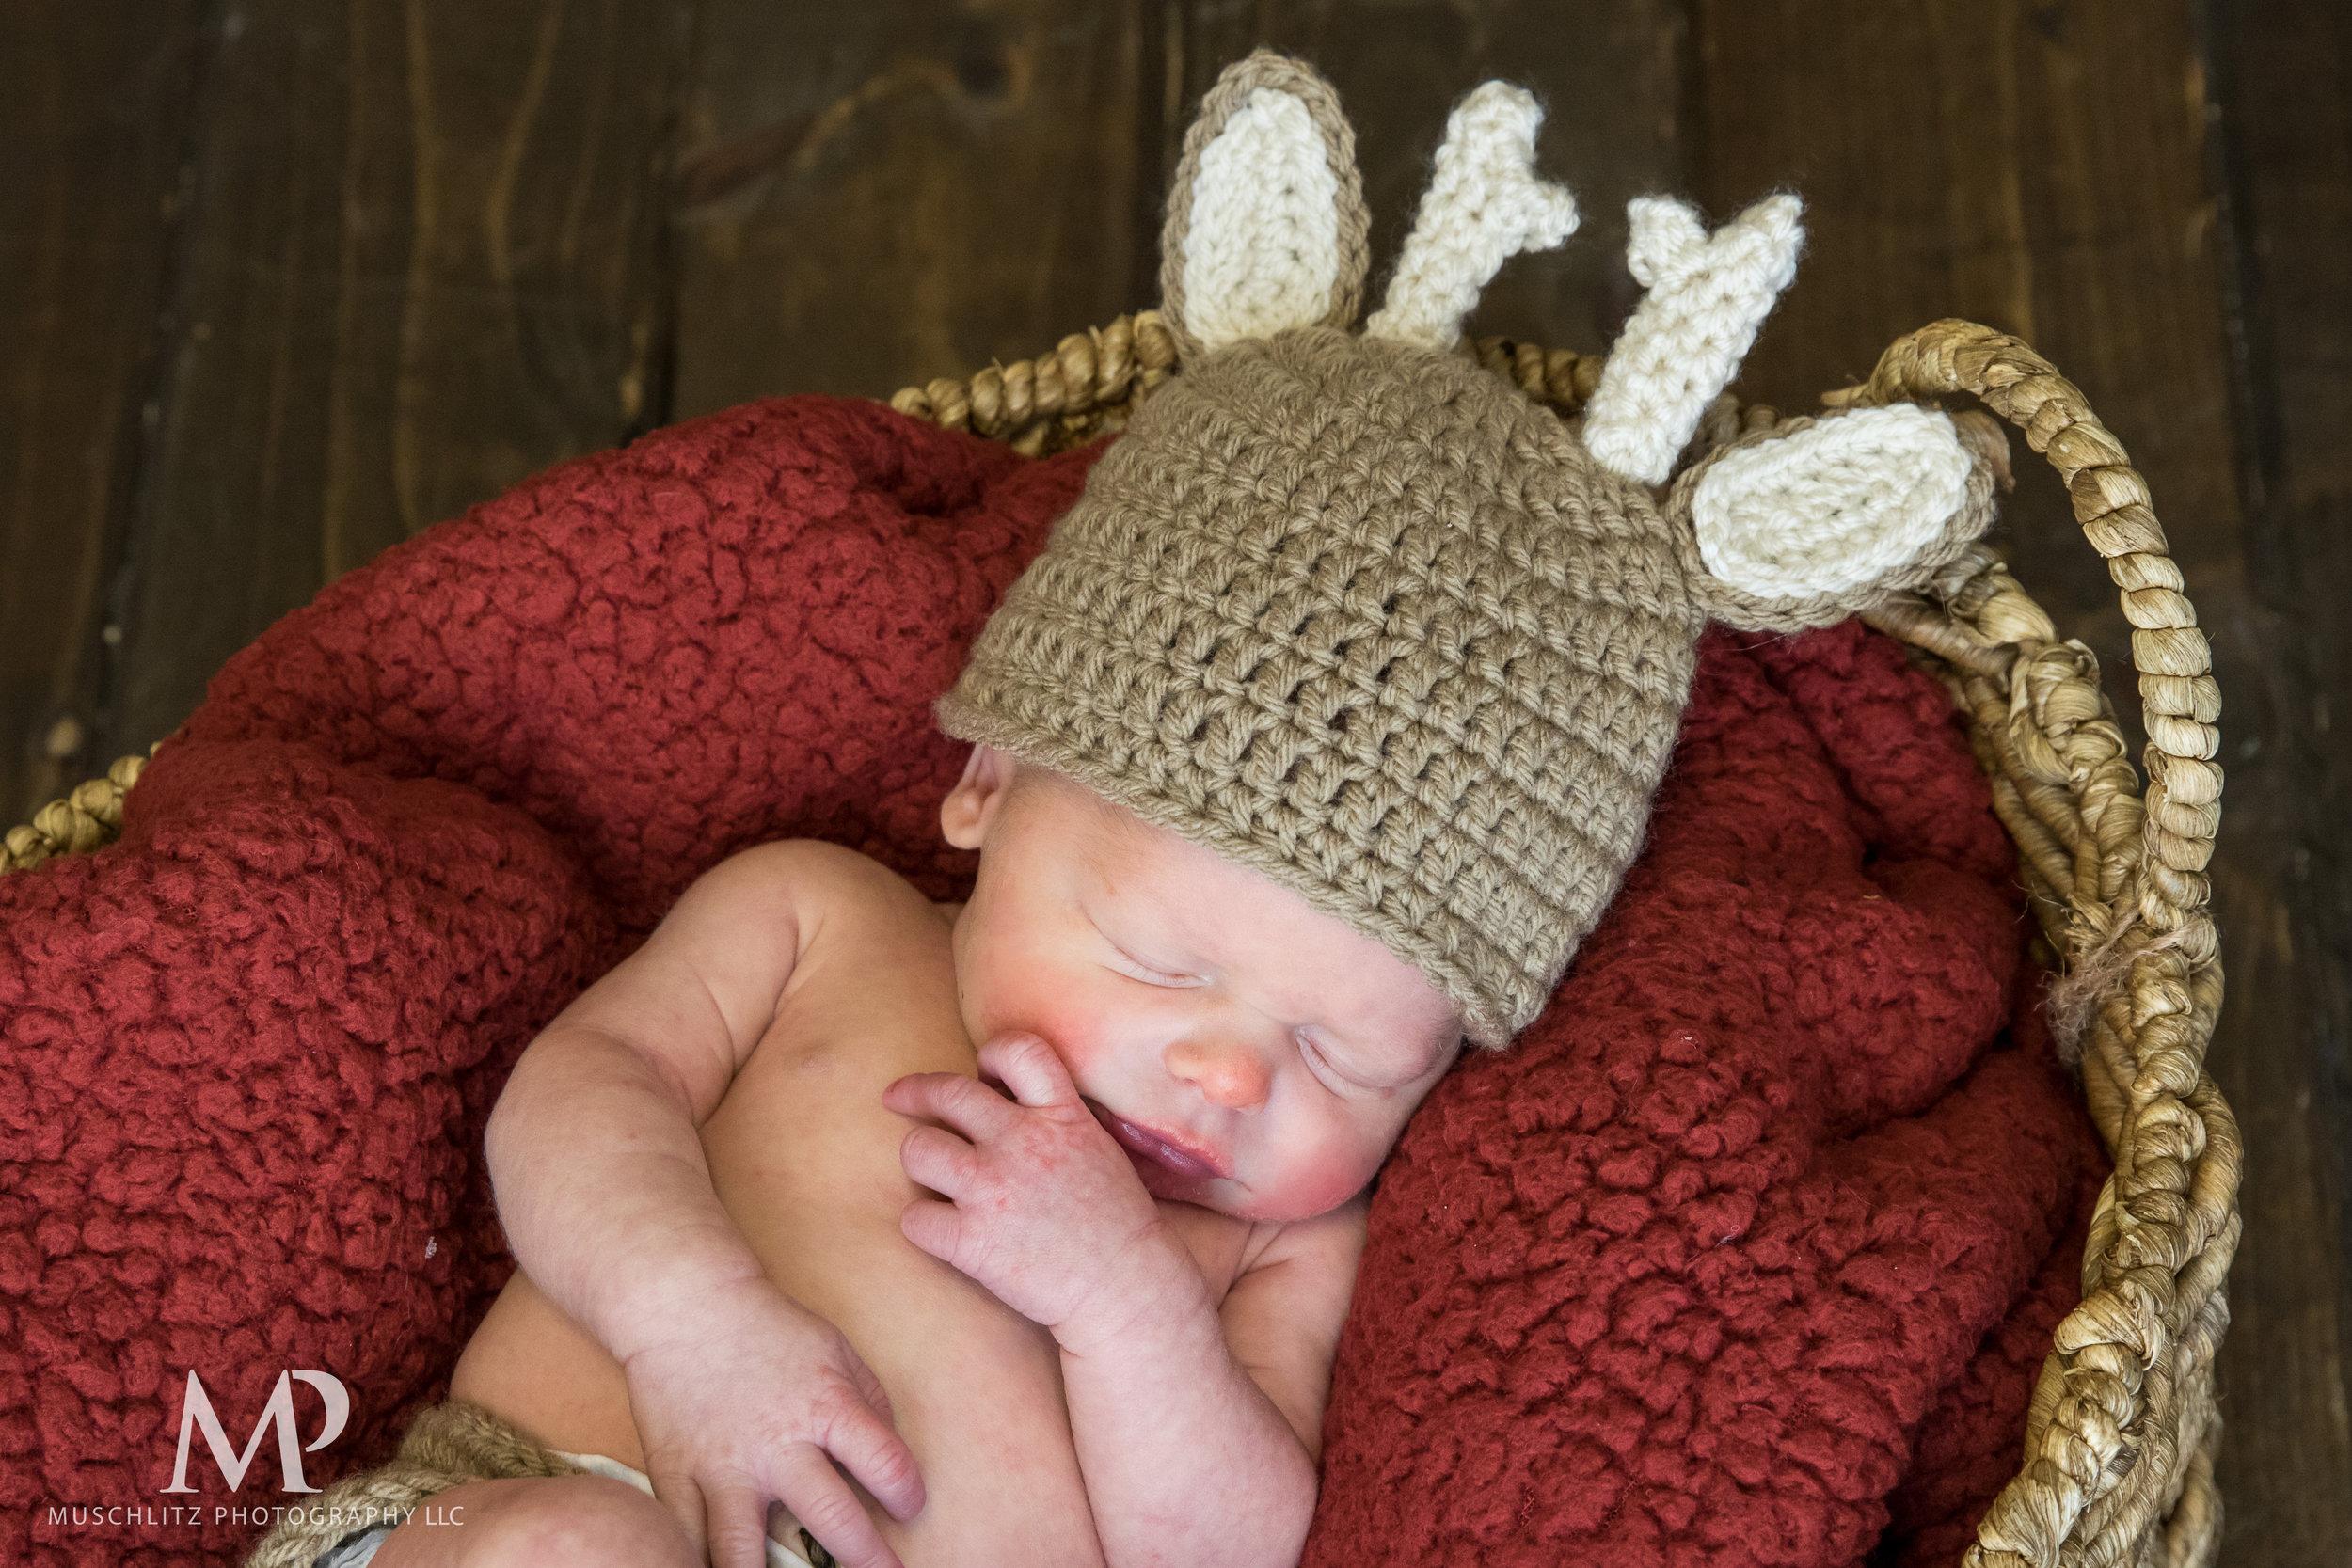 newborn-baby-portraits-photos-studio-holiday-columbus-gahanna-ohio-muschlitz-photography-003.JPG